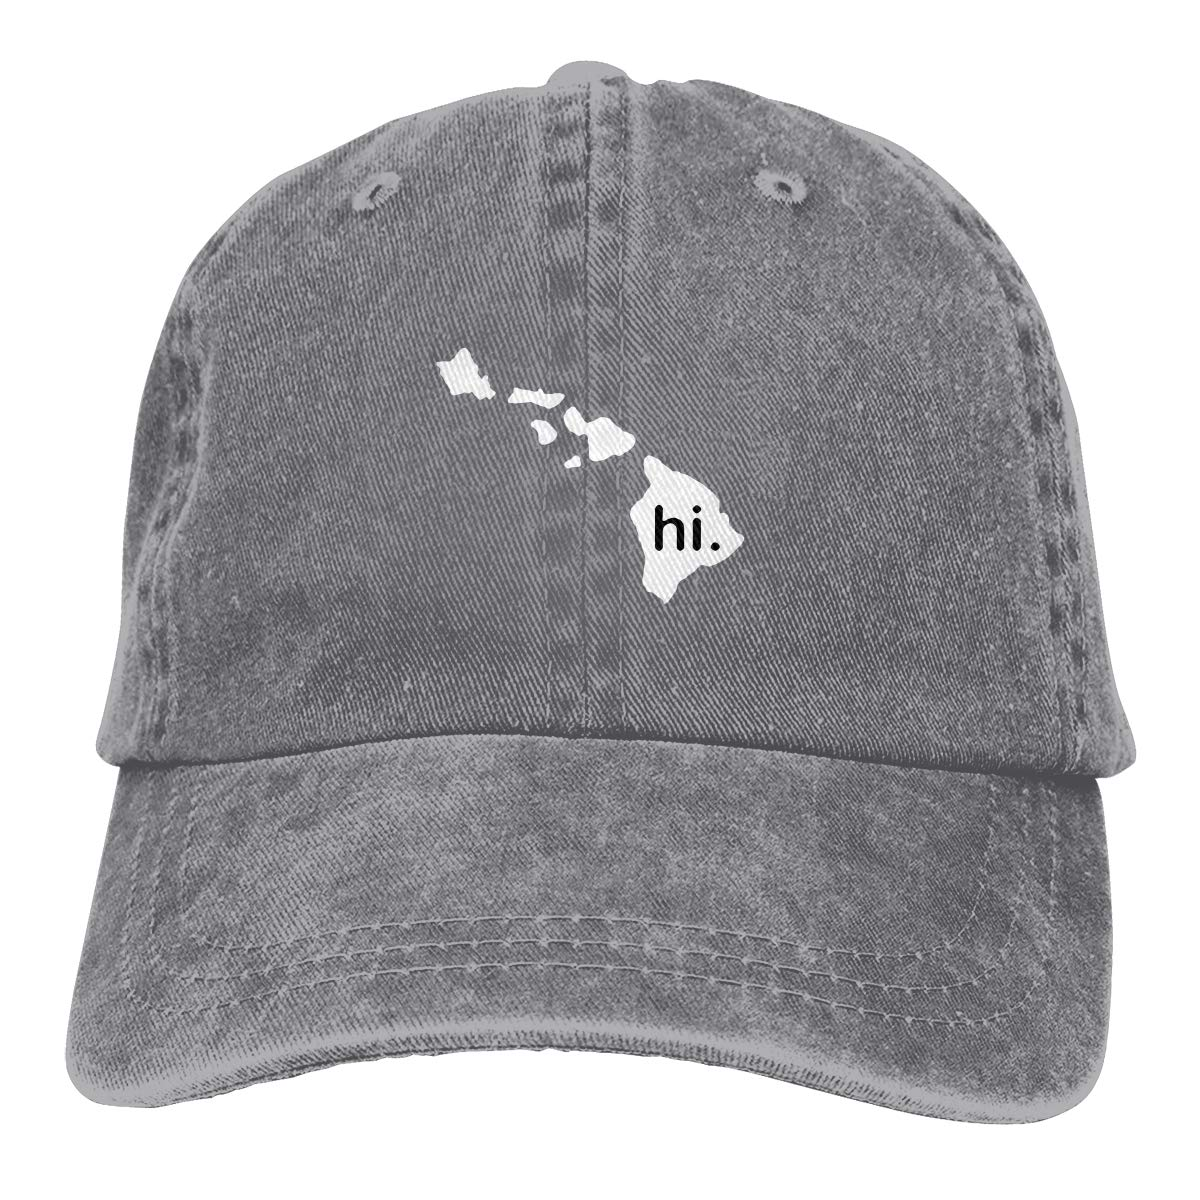 45511937 Amazon.com: Hi With Hawaii Island Vintage Adjustable Cowboy Cap Baseball Cap  ForMan And Woman: Clothing